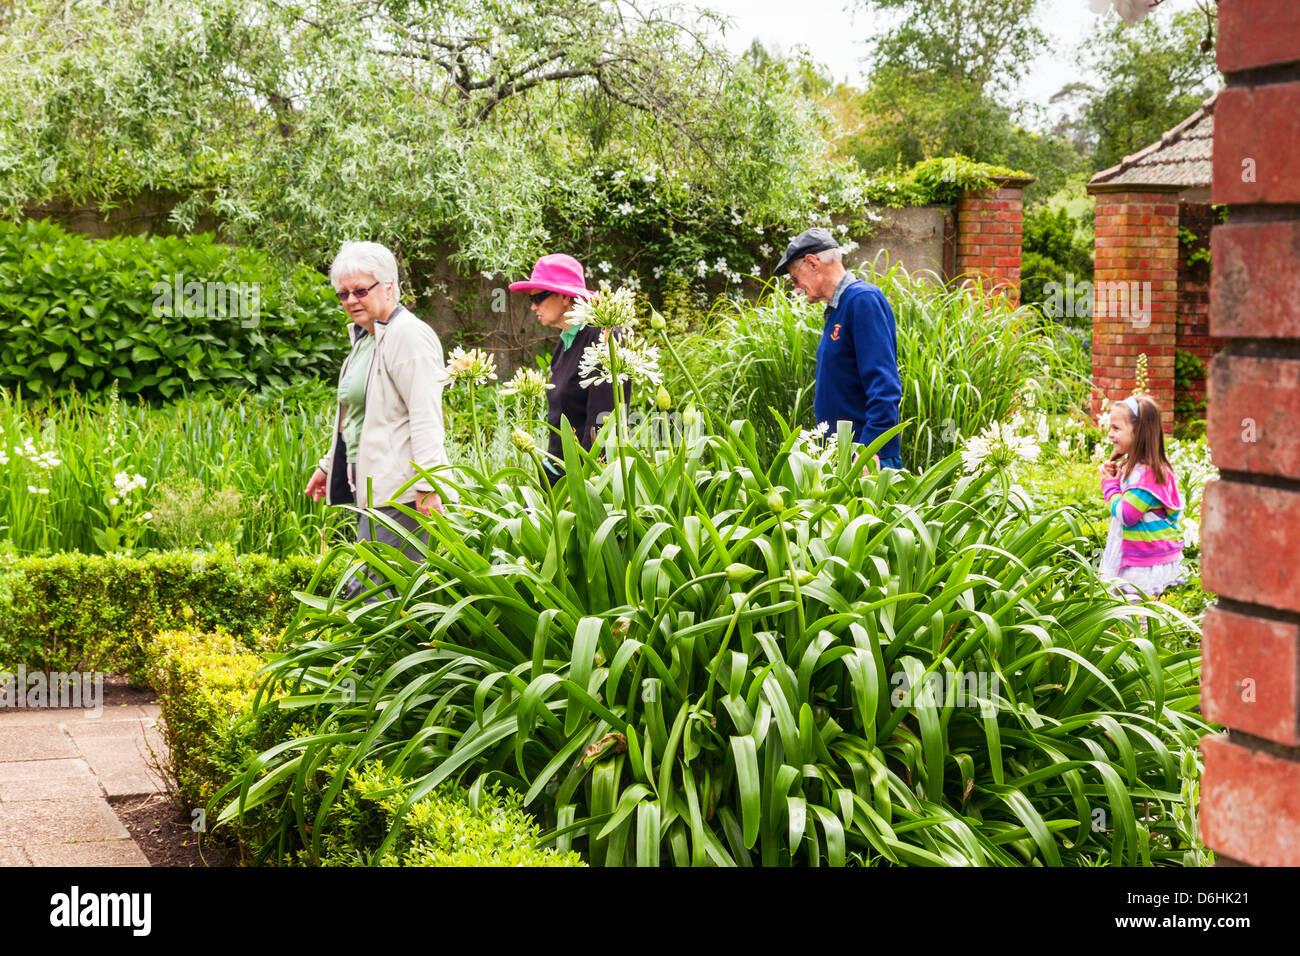 Visitors looking around the English Flower Garden, Hamilton Gardens, Hamilton, Waikato, New Zealand. Focus on foreground. - Stock Image